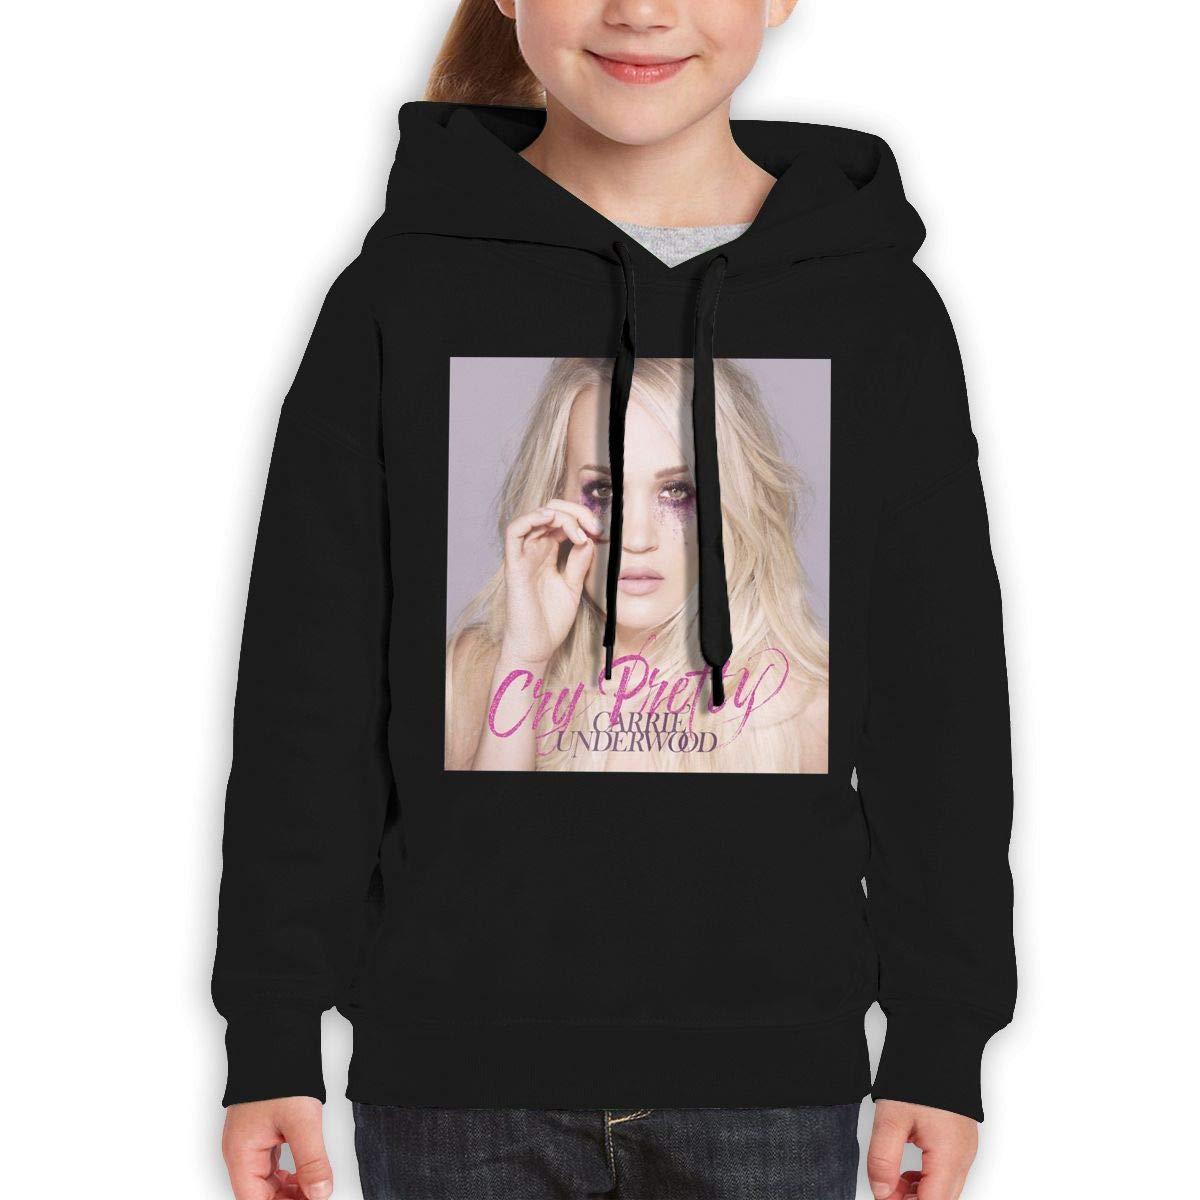 Guiping Cry Pretty Teen Hooded Sweate Sweatshirt Black